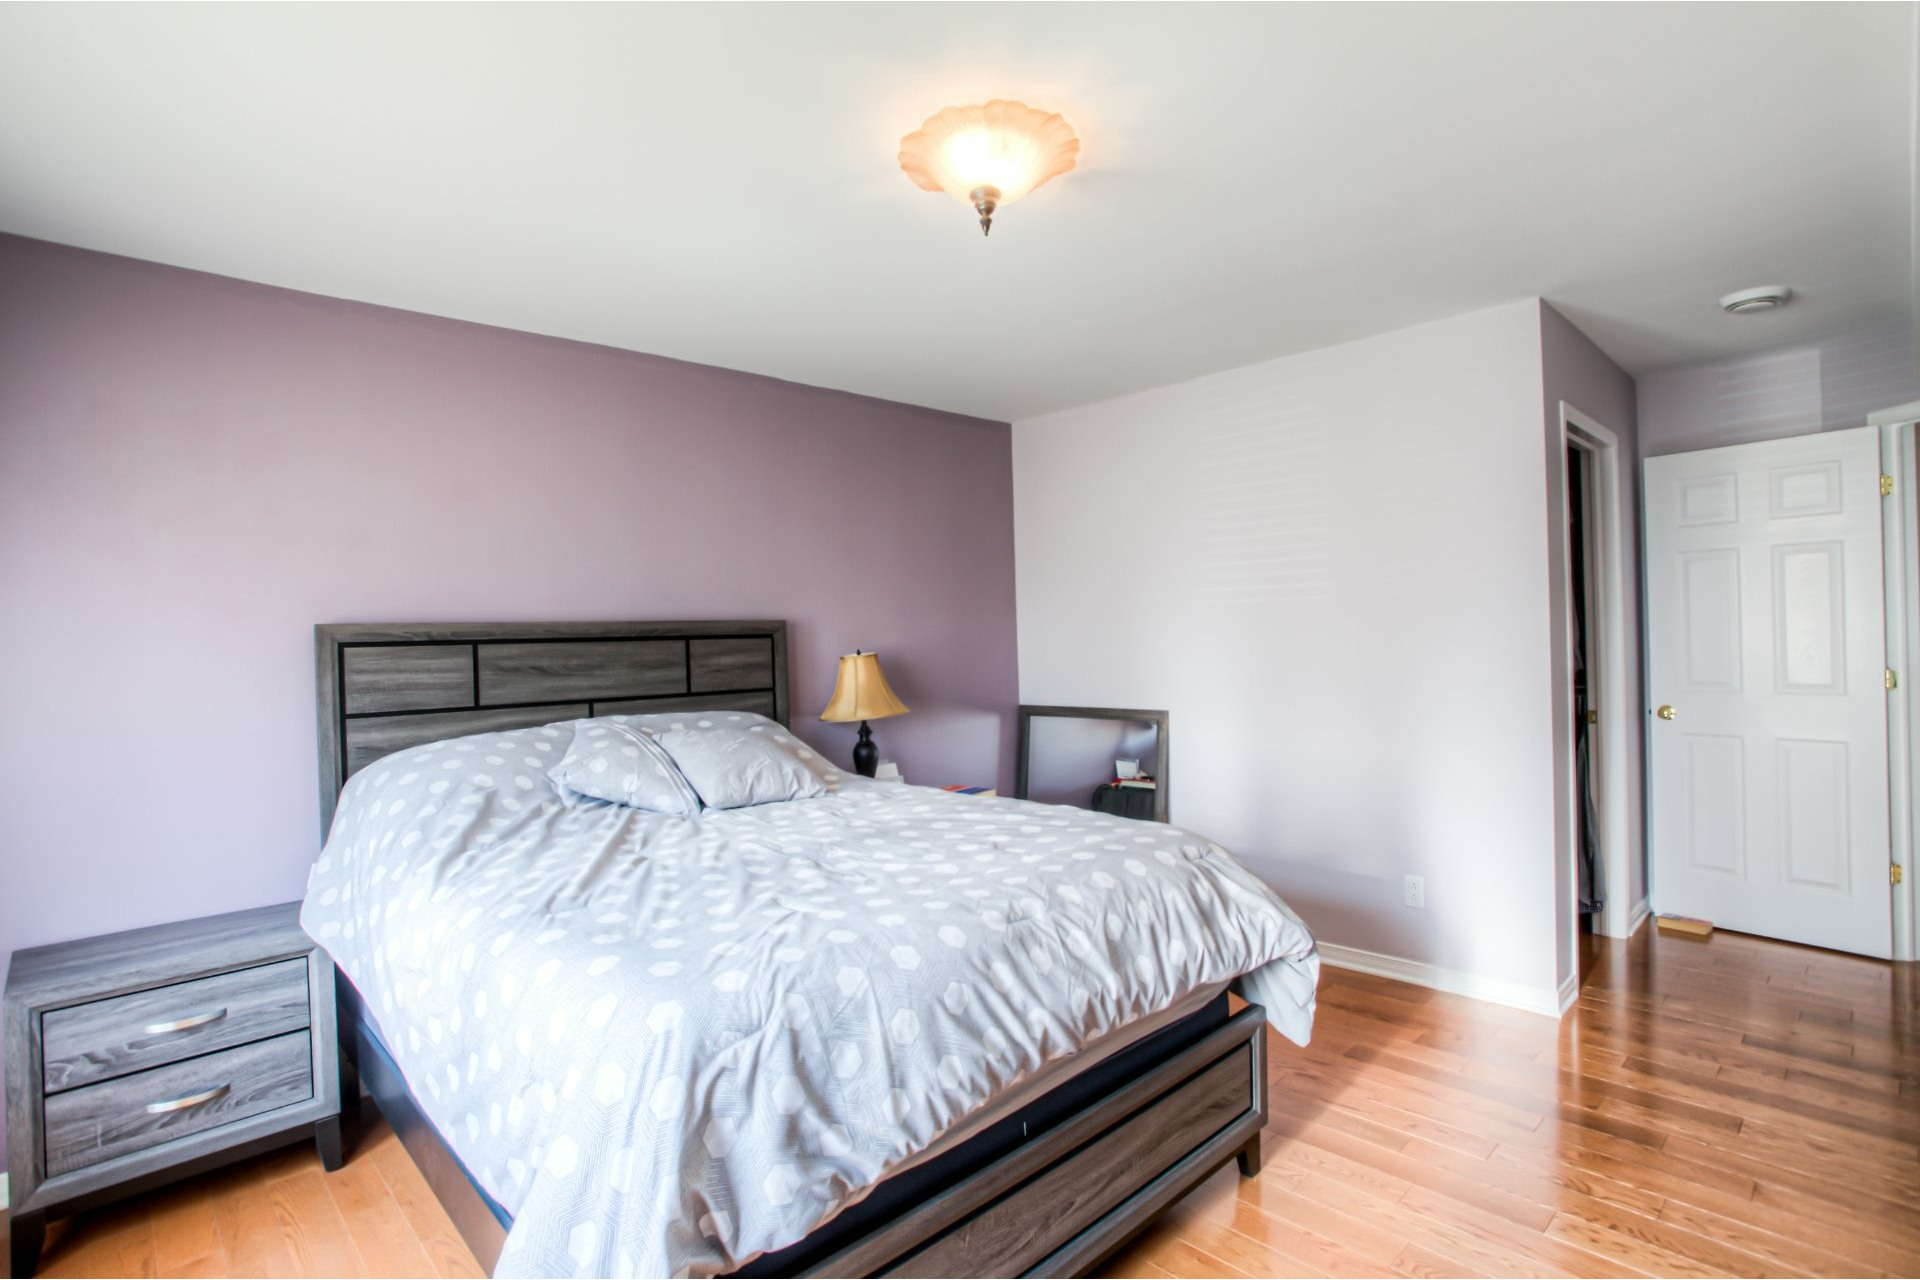 image 13 - Apartment For sale Vaudreuil-Dorion - 9 rooms